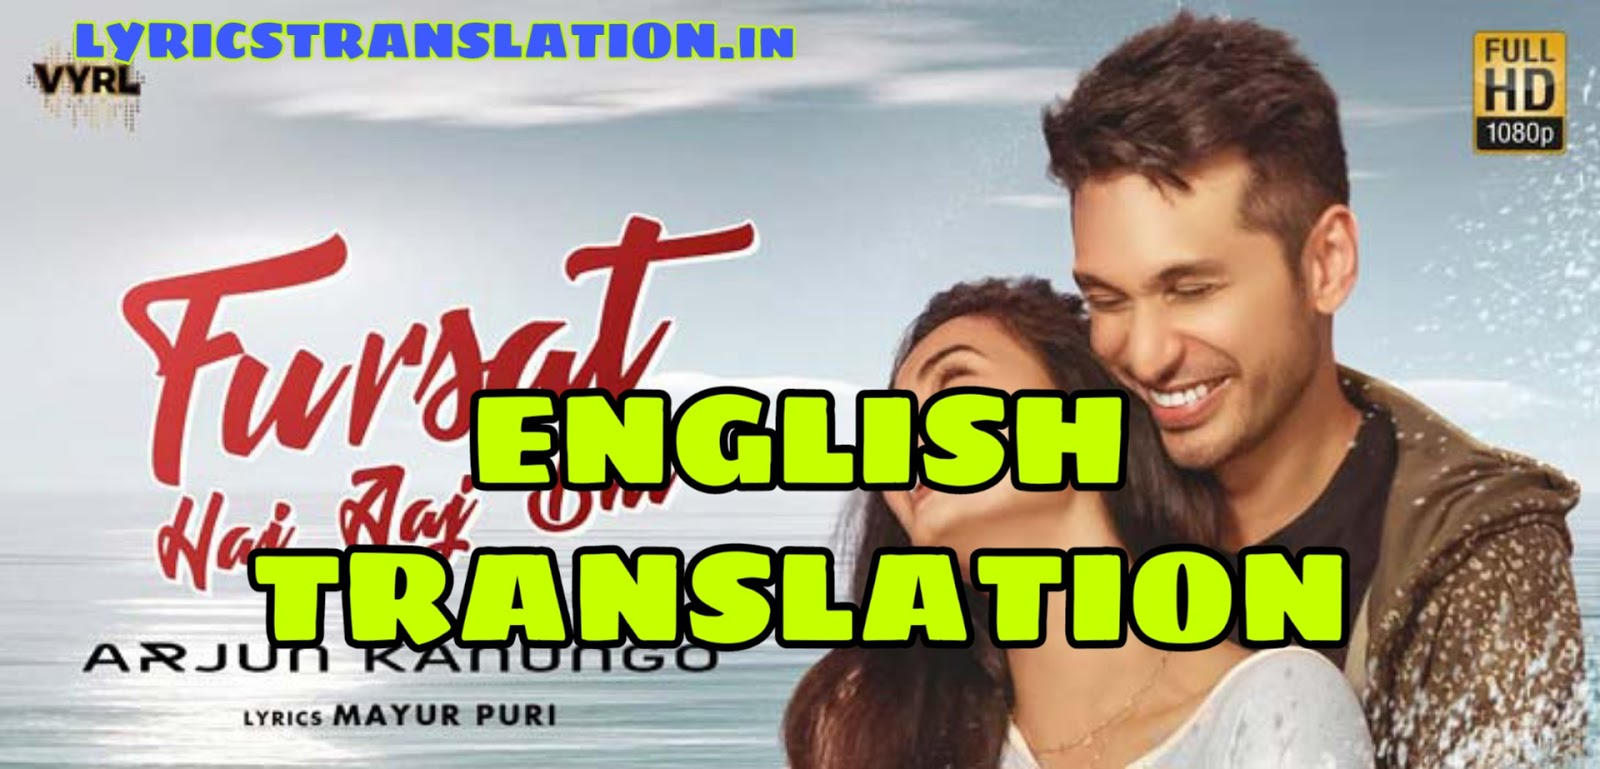 Fursat Hai Aaj Bhi Lyrics Translation In English Arjun Kanungo Gaana offers you free, unlimited access to over 45 million hindi songs, bollywood music. fursat hai aaj bhi lyrics translation